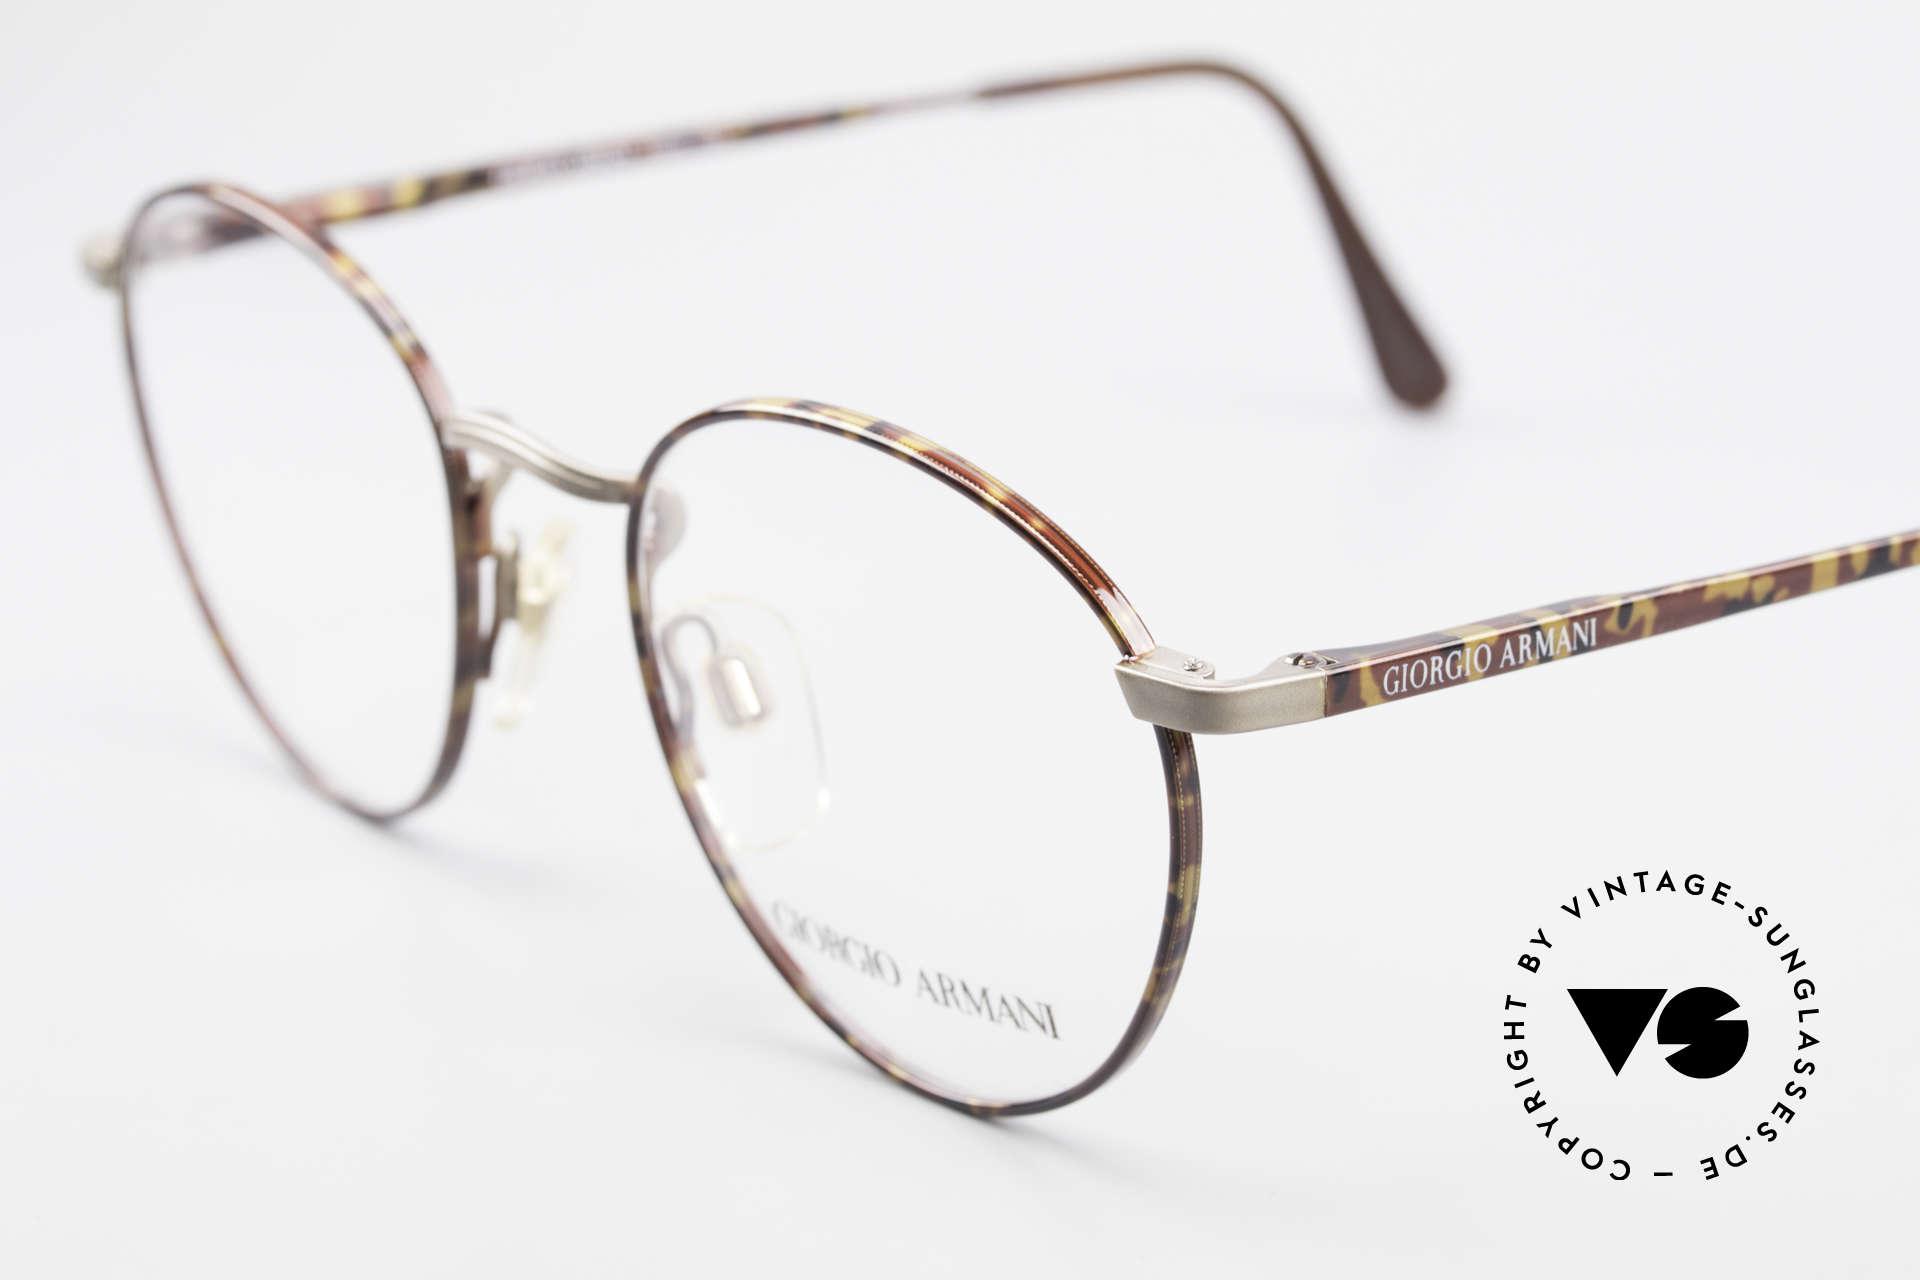 Giorgio Armani 166 No Retro Glasses 80's Panto, never worn (like all our rare vintage Armani glasses), Made for Men